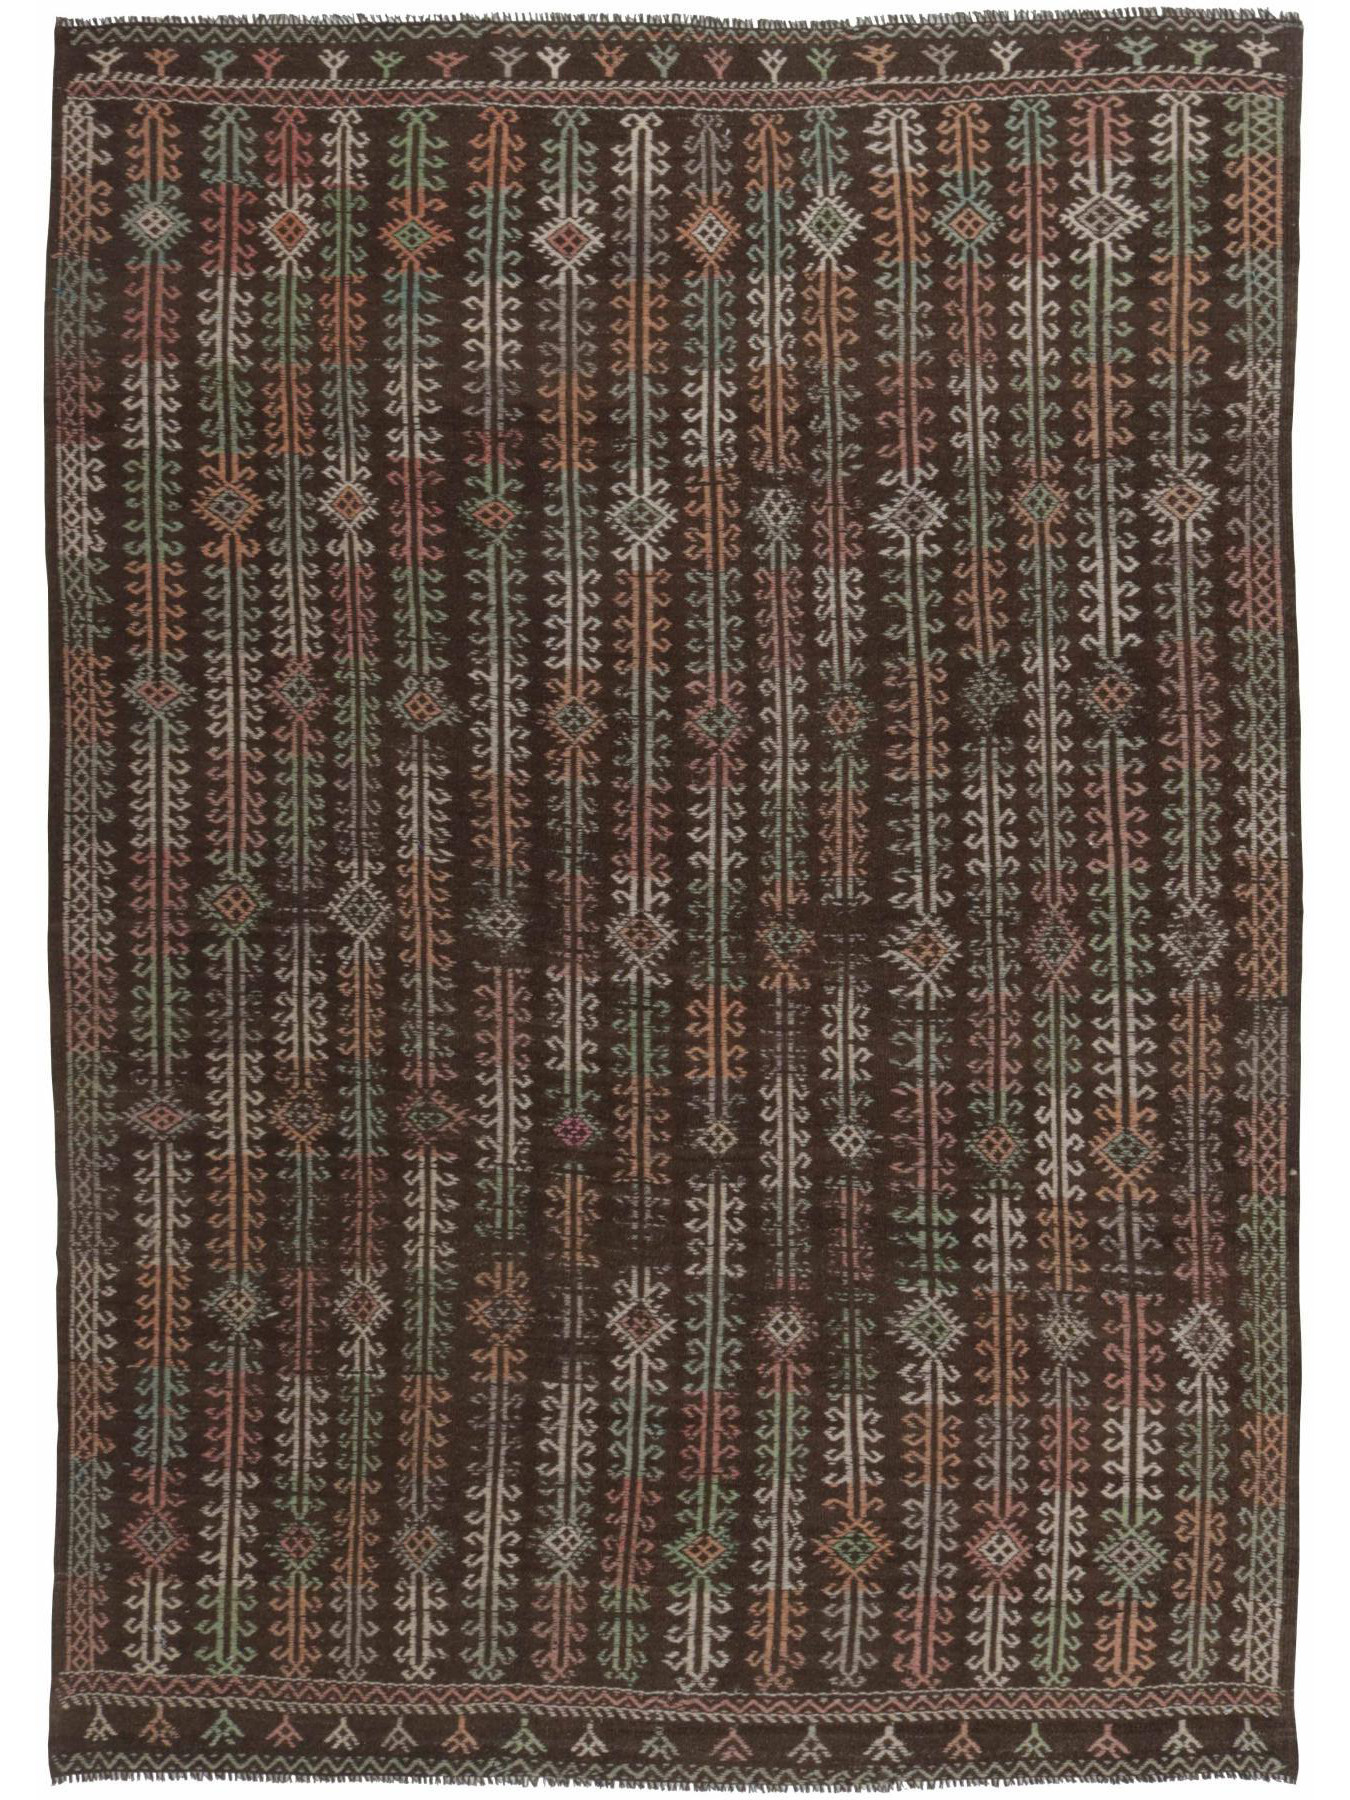 Traditional kilims - Kilim Persian Vintage Fine